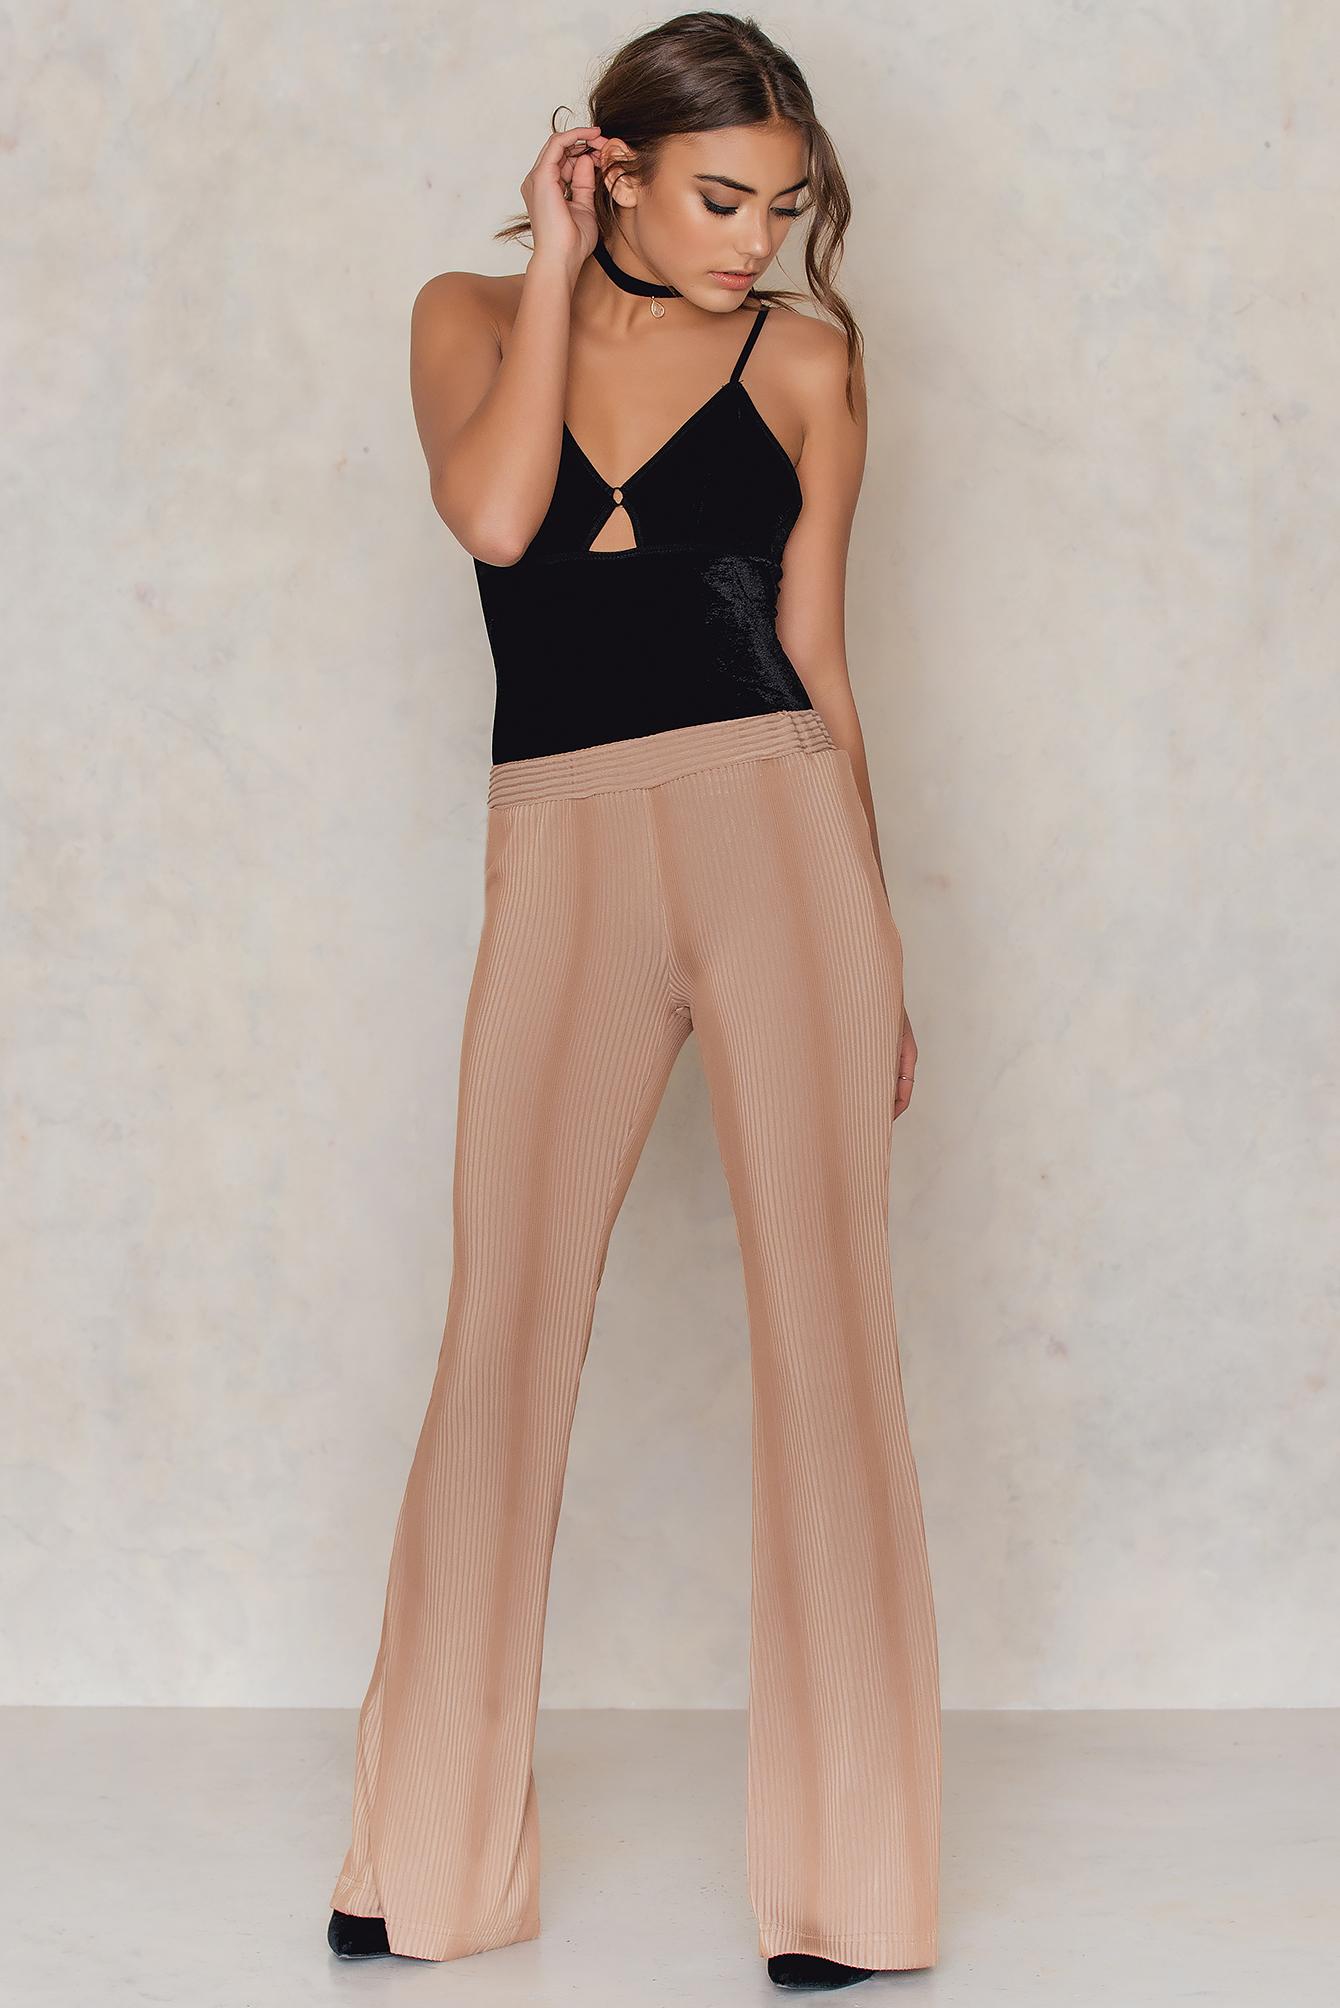 aéryne x na-kd -  Fuyu Trousers - Beige,Nude